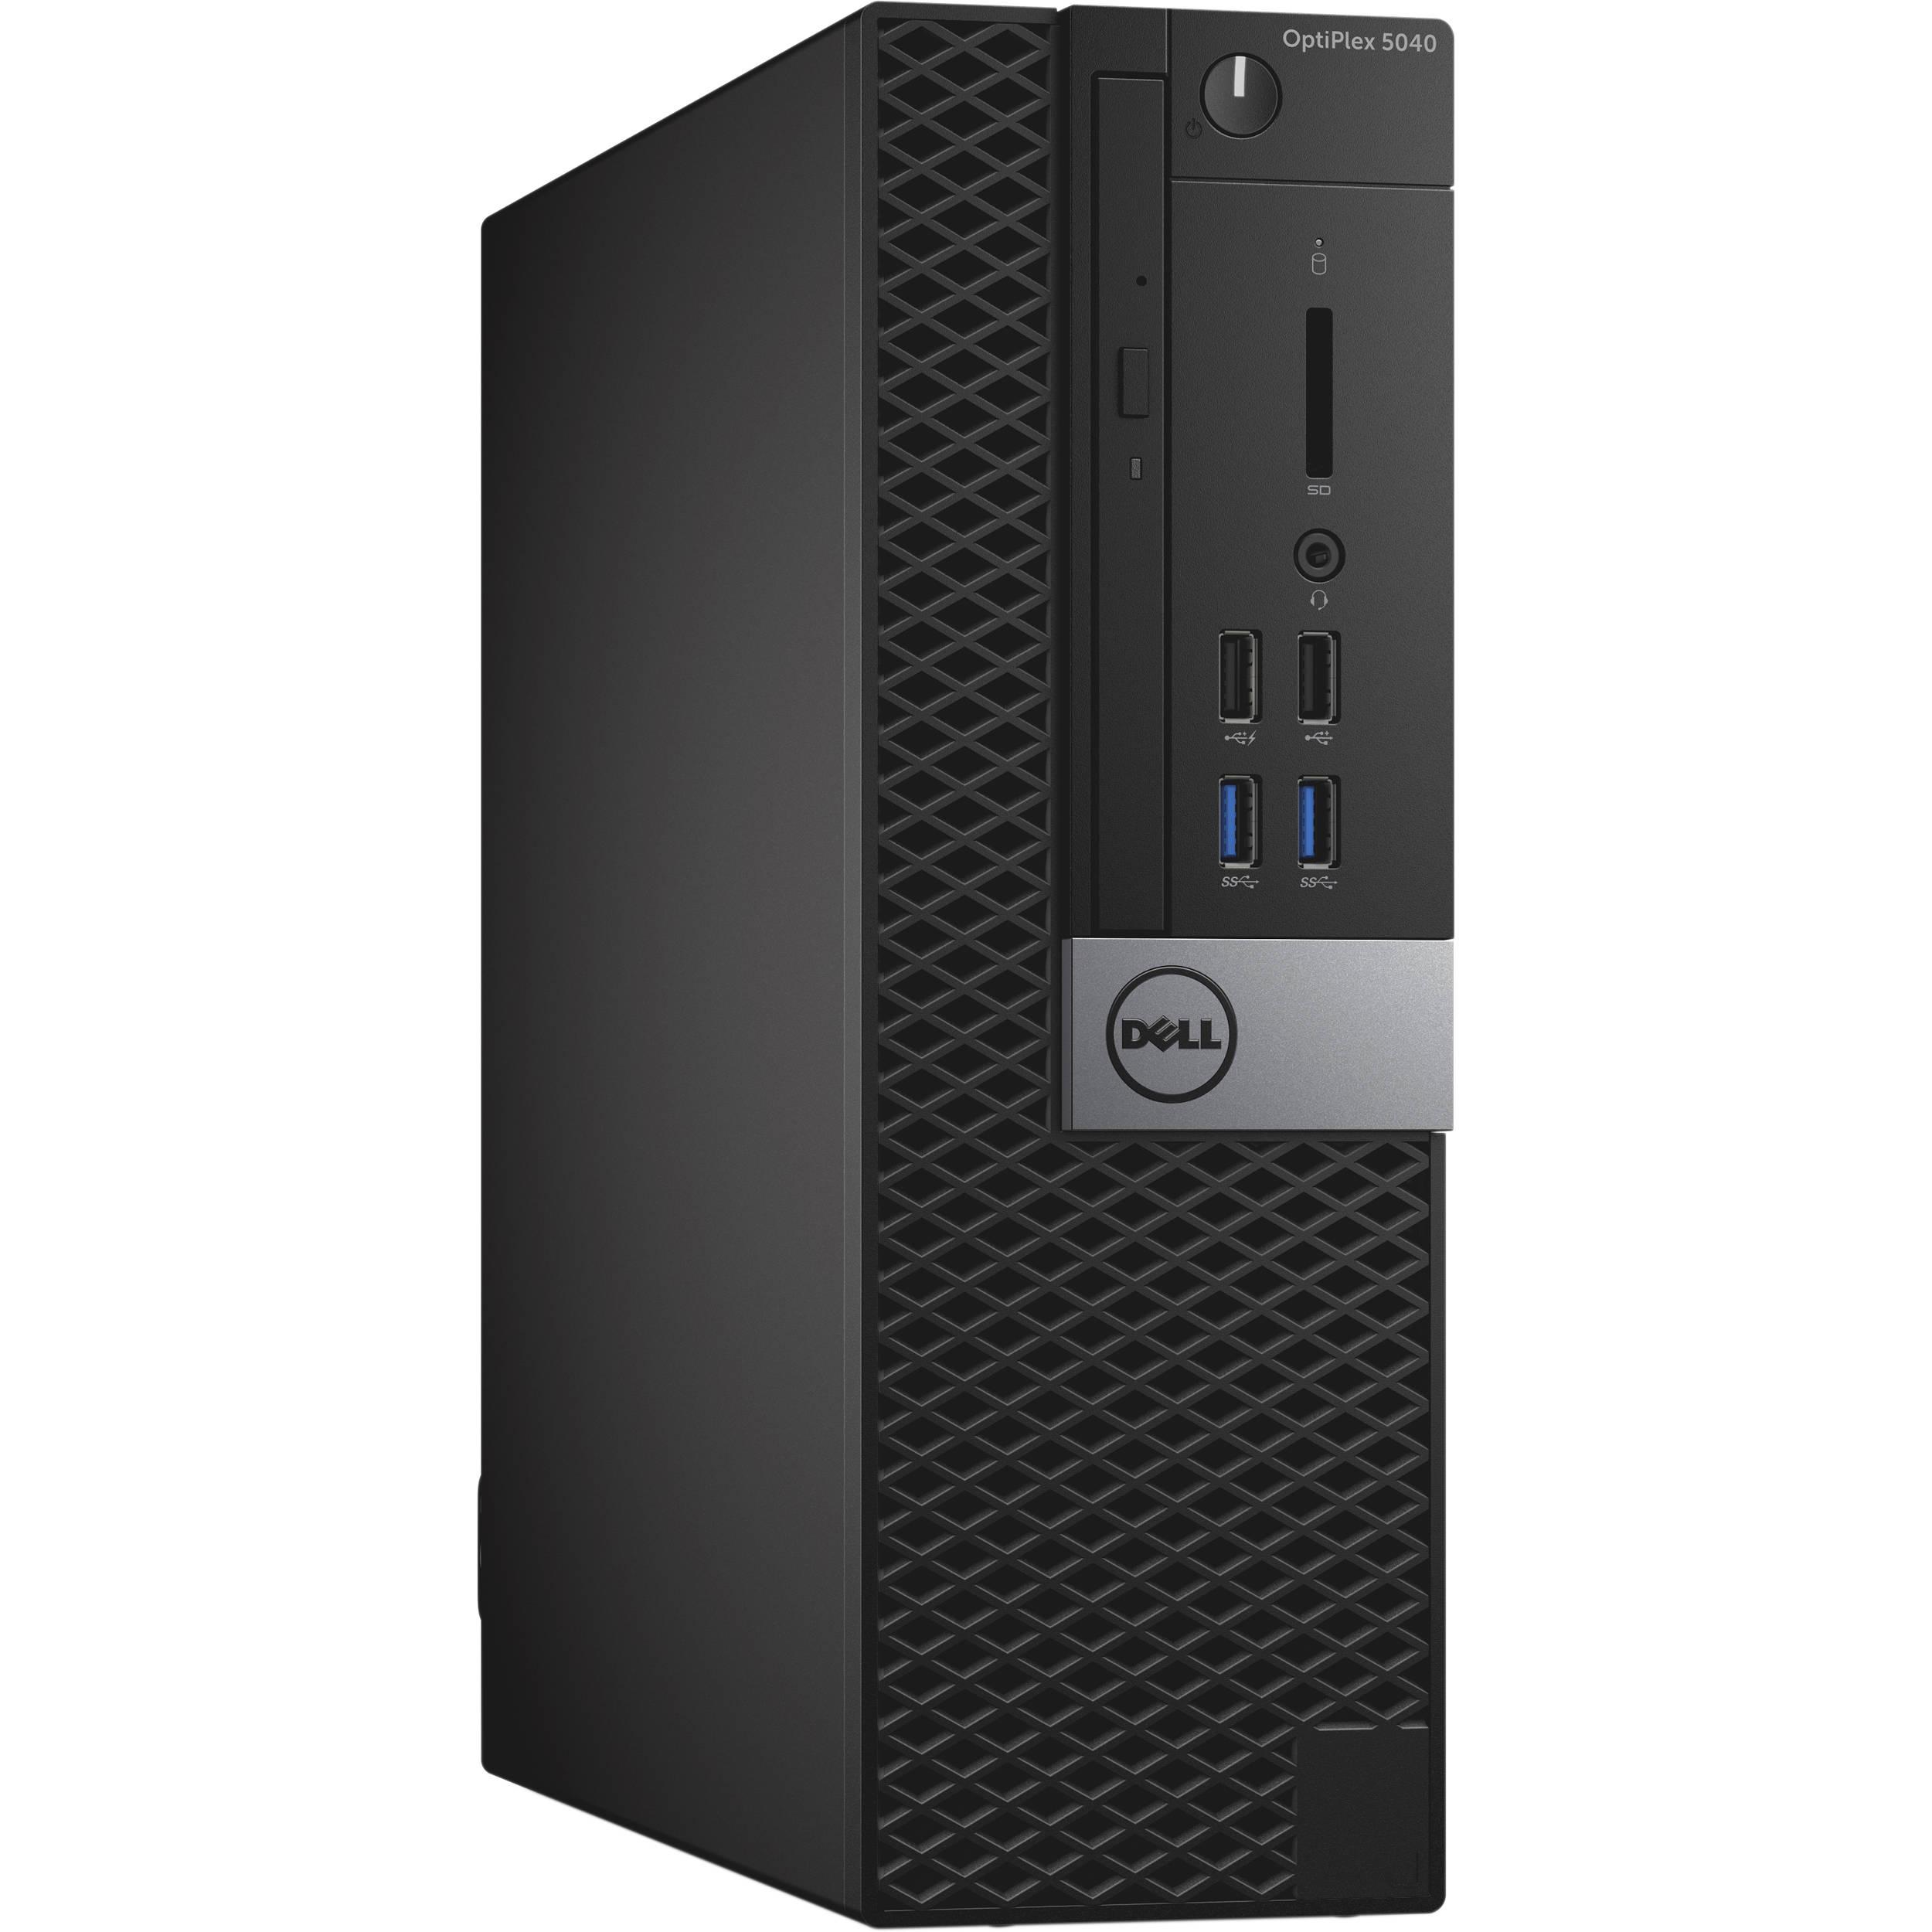 Refurbished pc Dell Optiplex 5040 SFF i5-6500 8GB 500GB DVDRW WINDOWS 10 HOME MAR GR